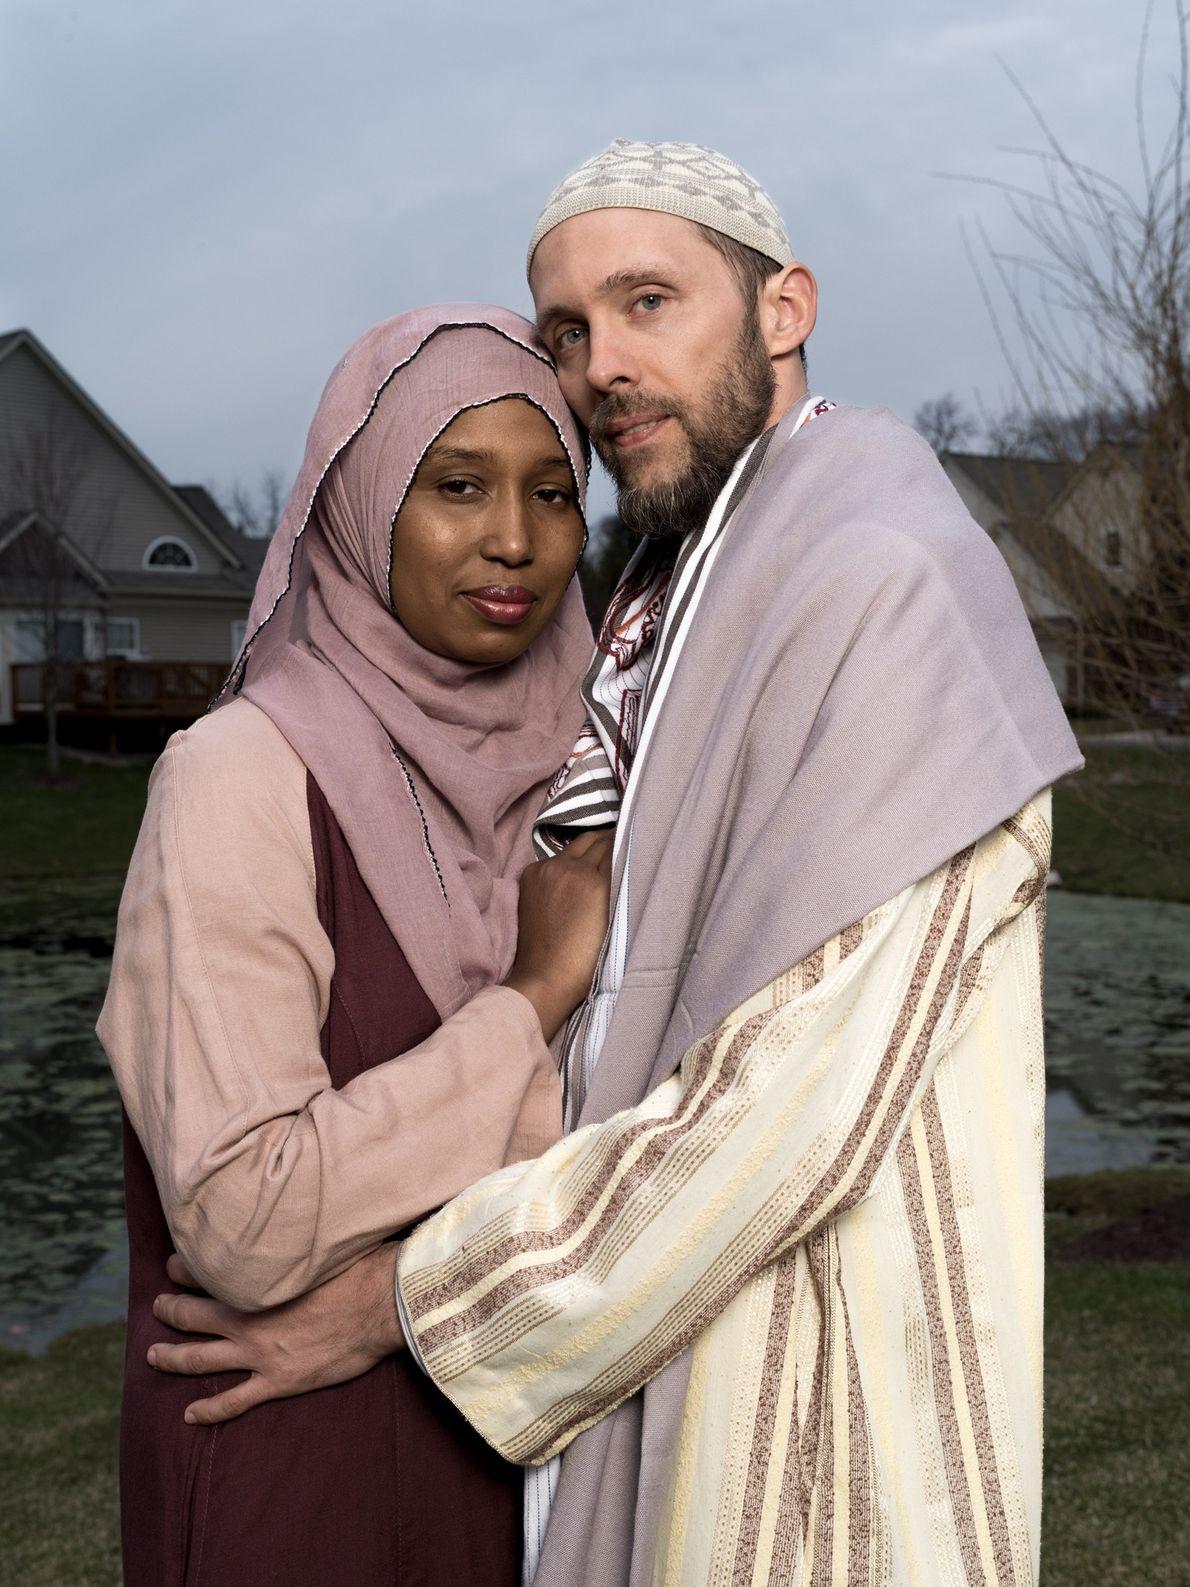 Kamilah Munirah Bolling e Adil Justin Cole em frente à sua casa em Farmington Hills, Michigan.